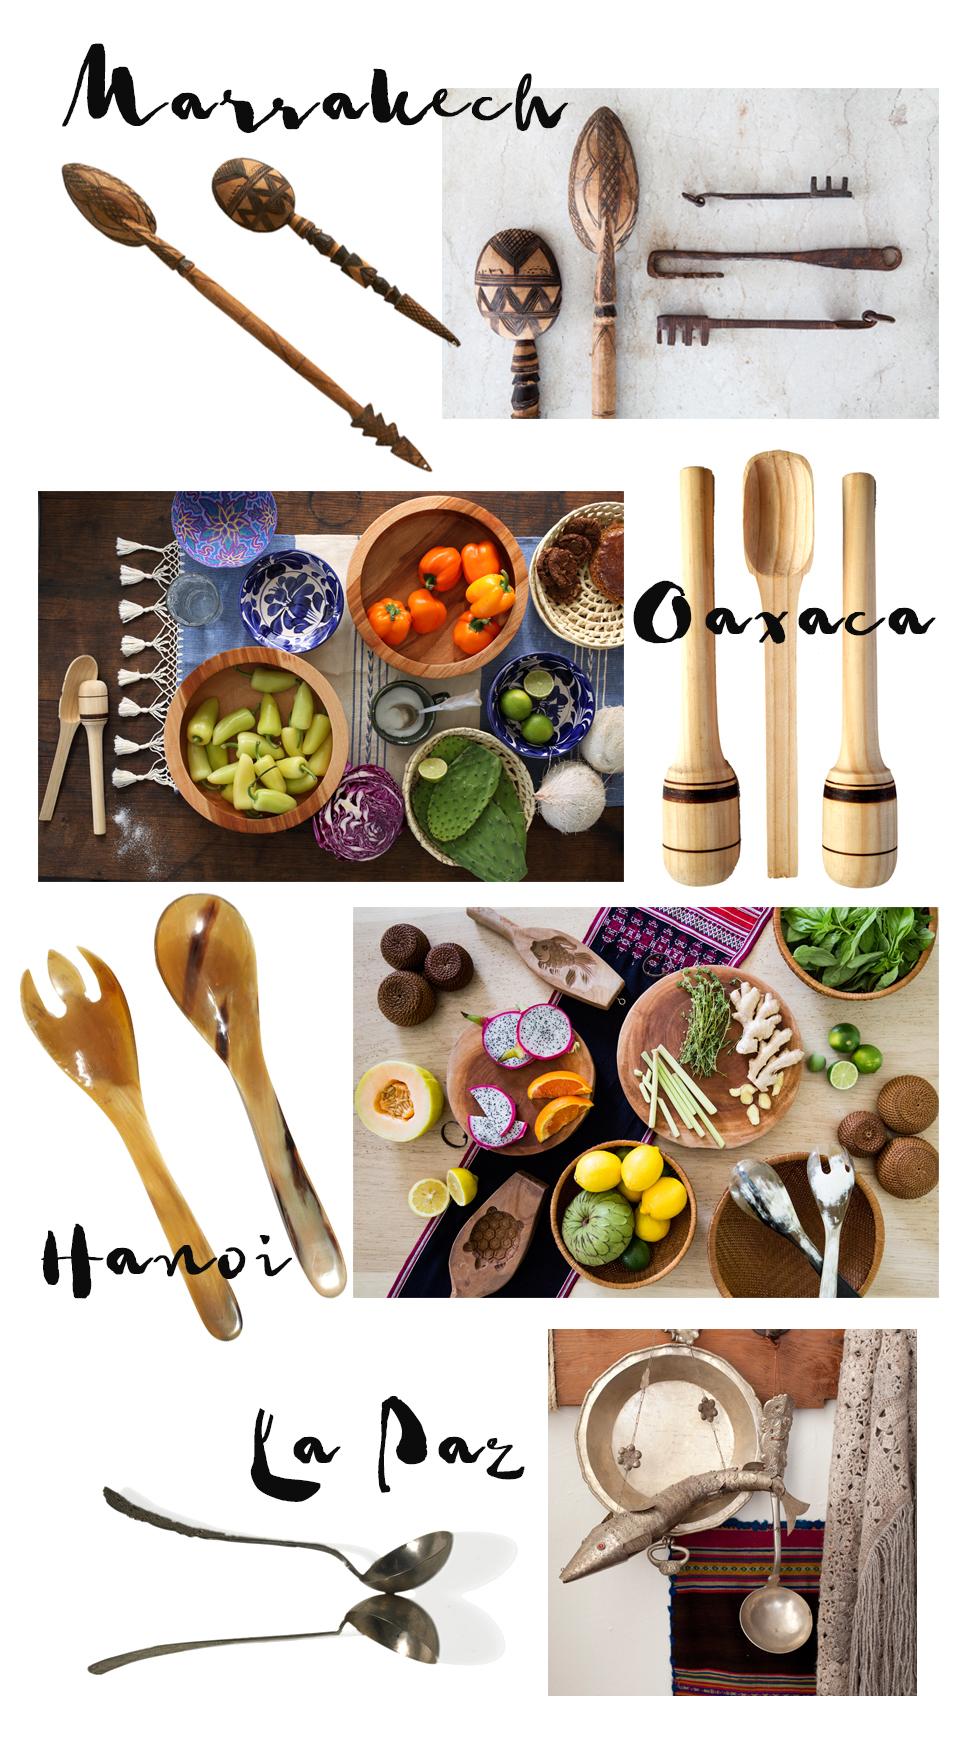 Spoon-image-2